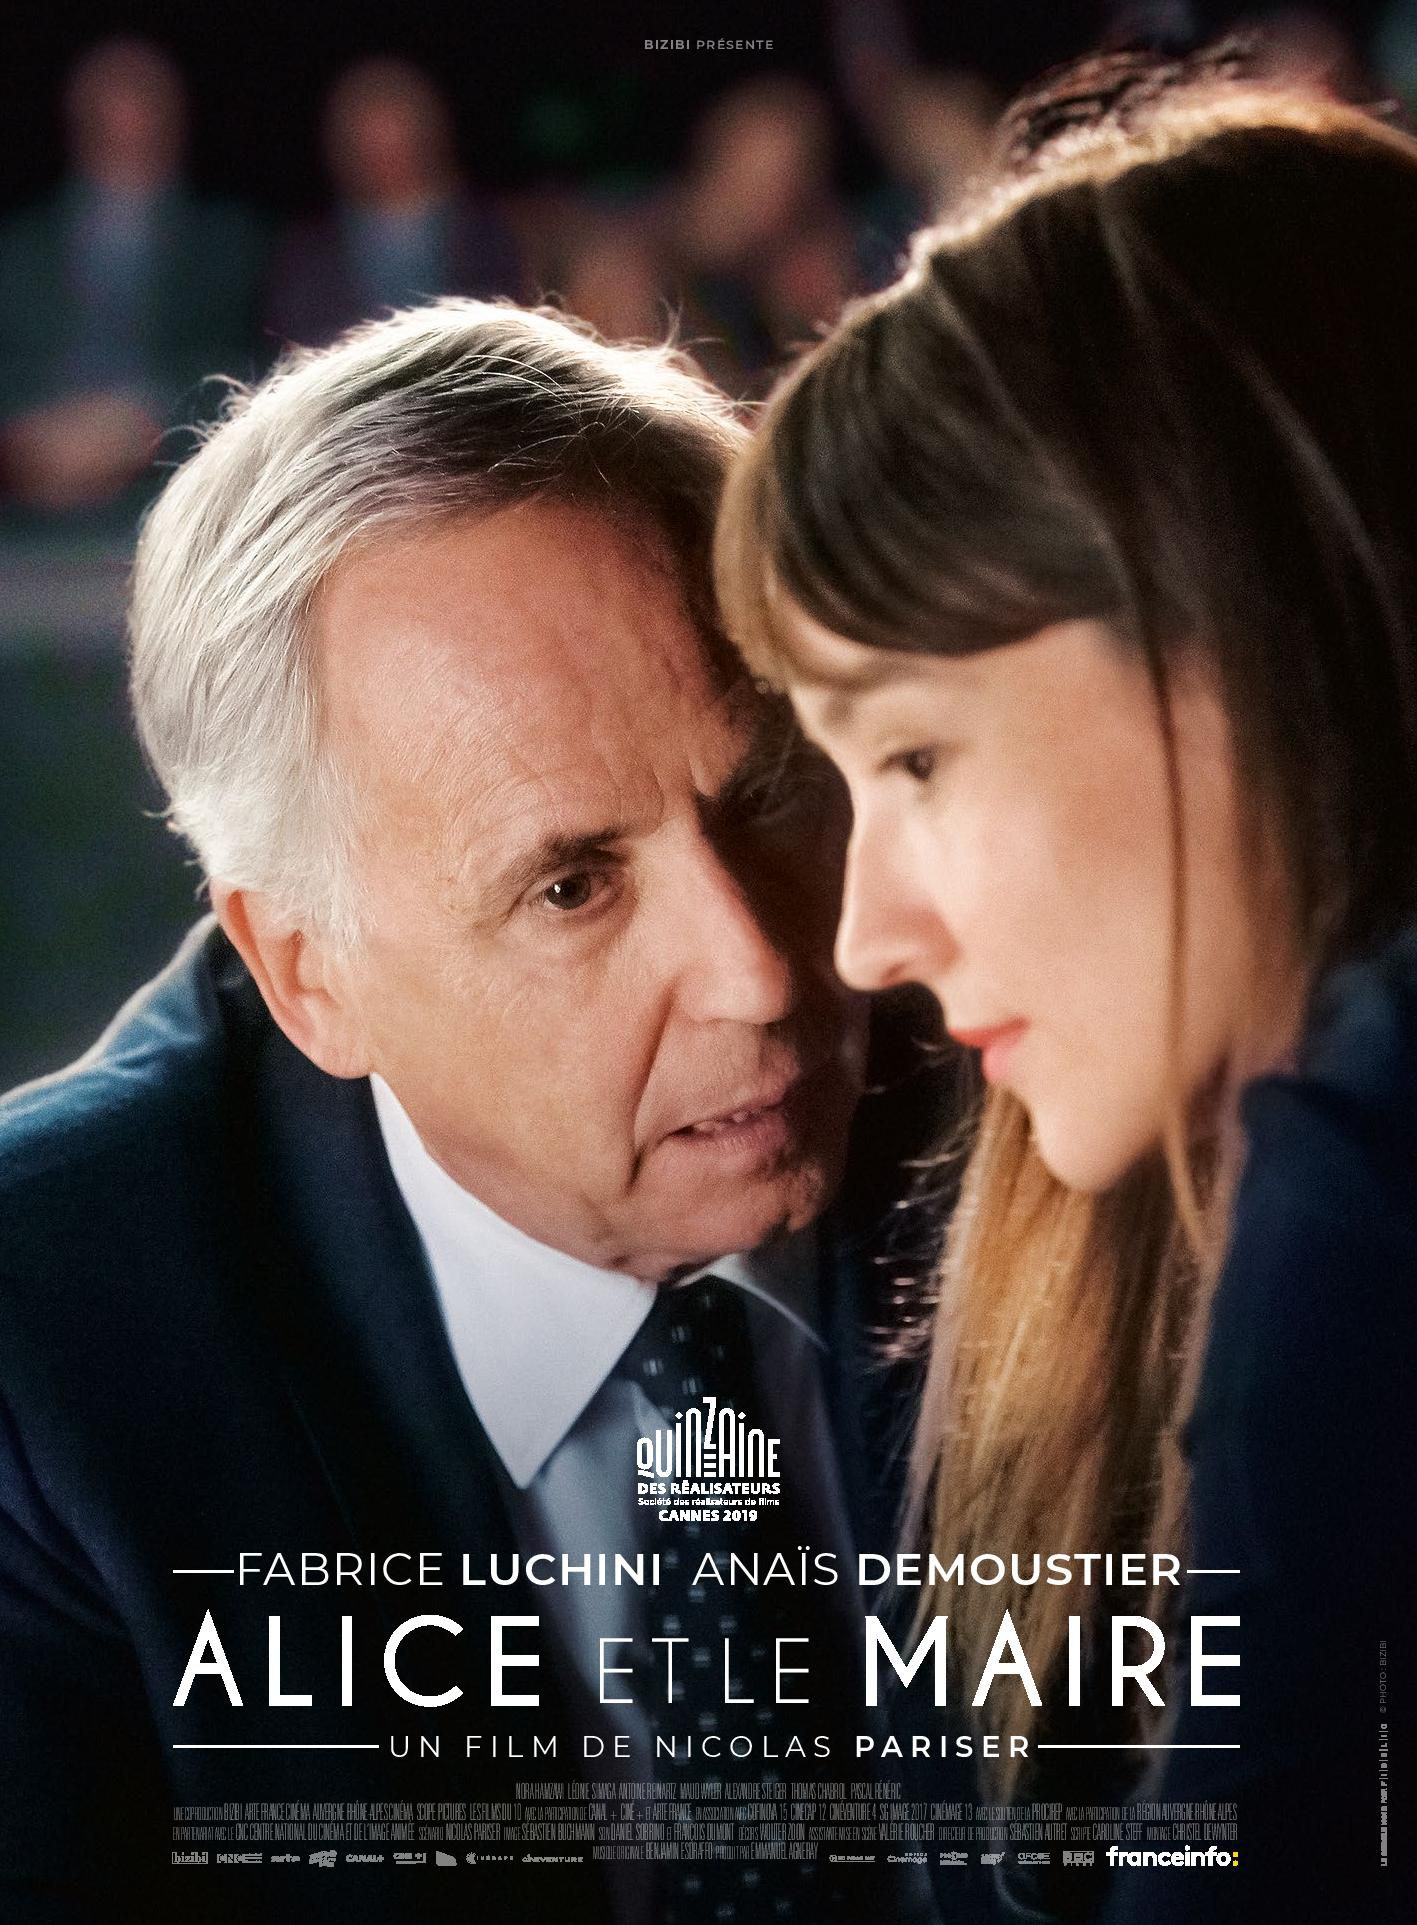 Alice et le Maire - Film (2019)